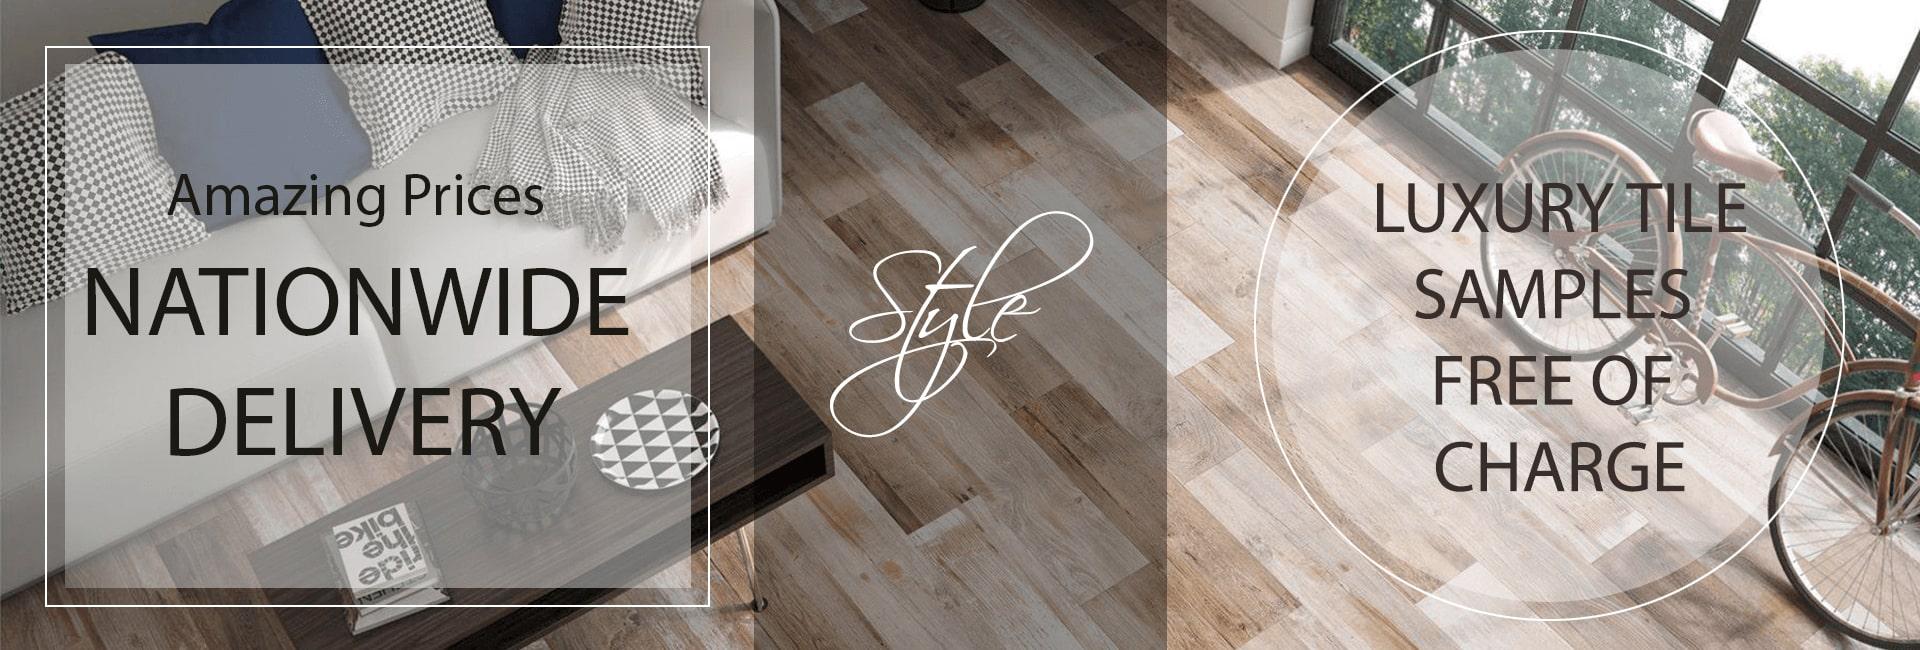 Tiles Liverpool Kitchen Bathroom Tiles Mazzanna Tiles